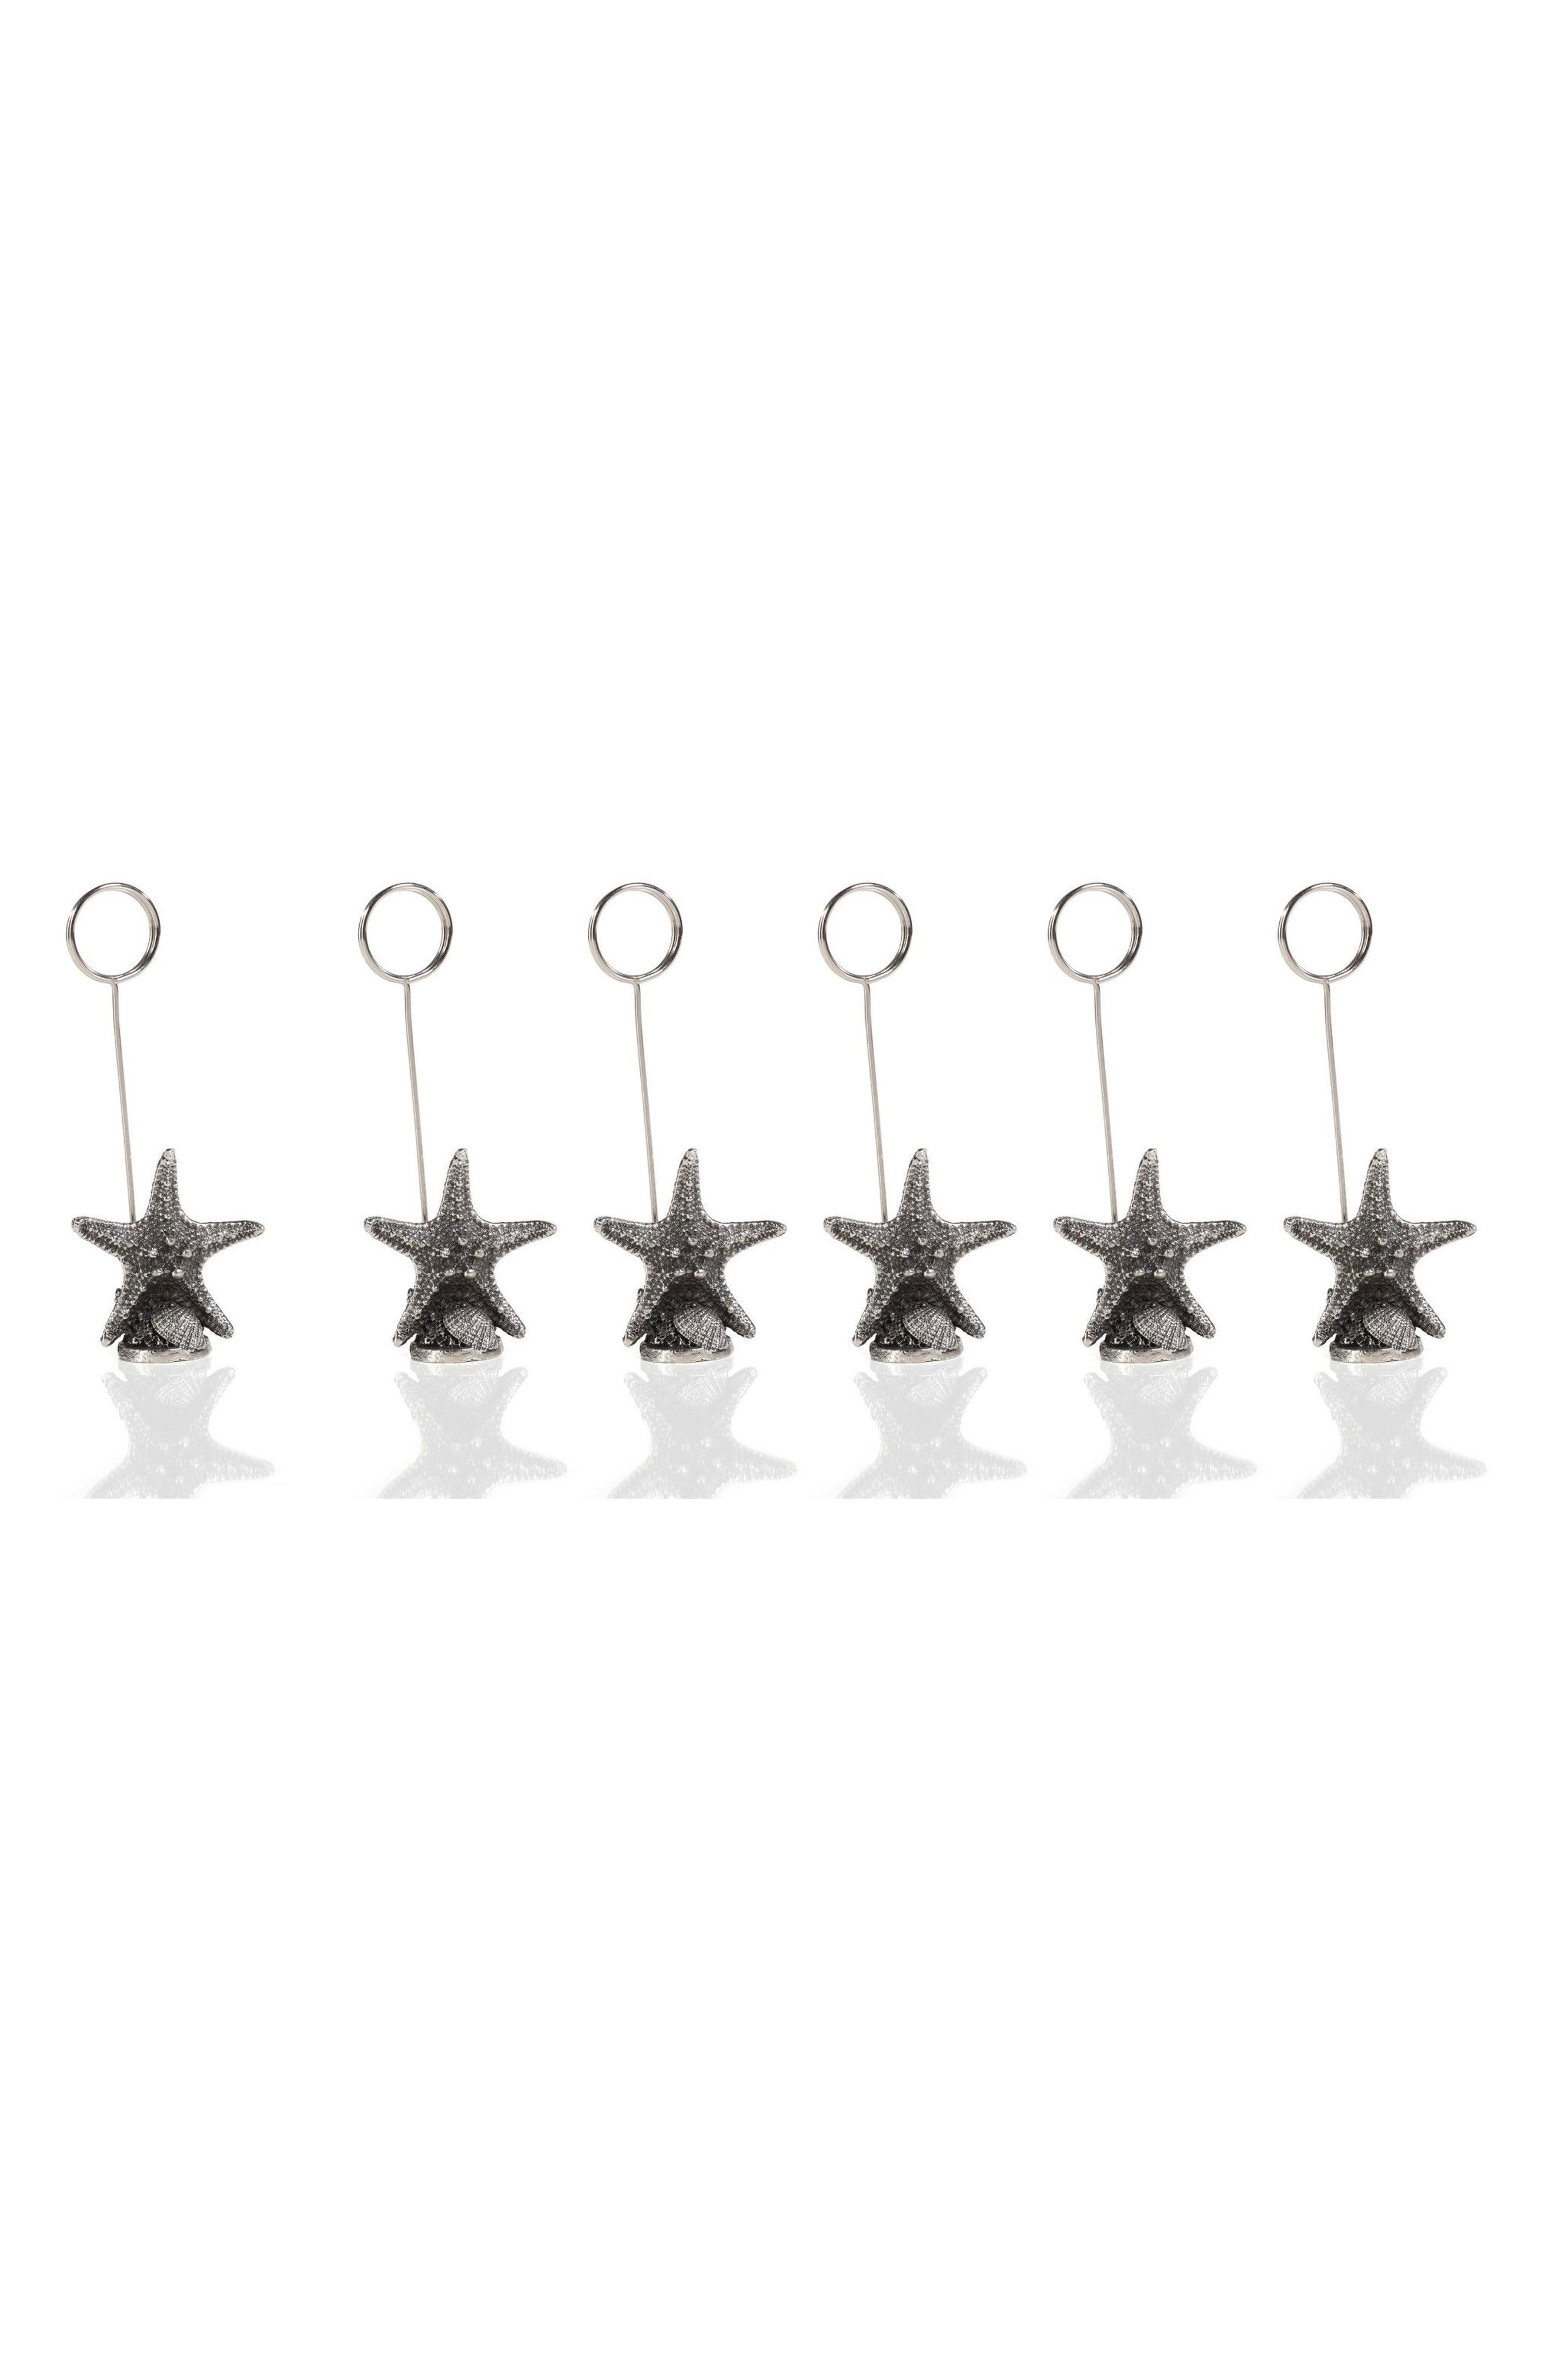 Set of 6 Starfish Name Card Holders,                             Main thumbnail 1, color,                             040